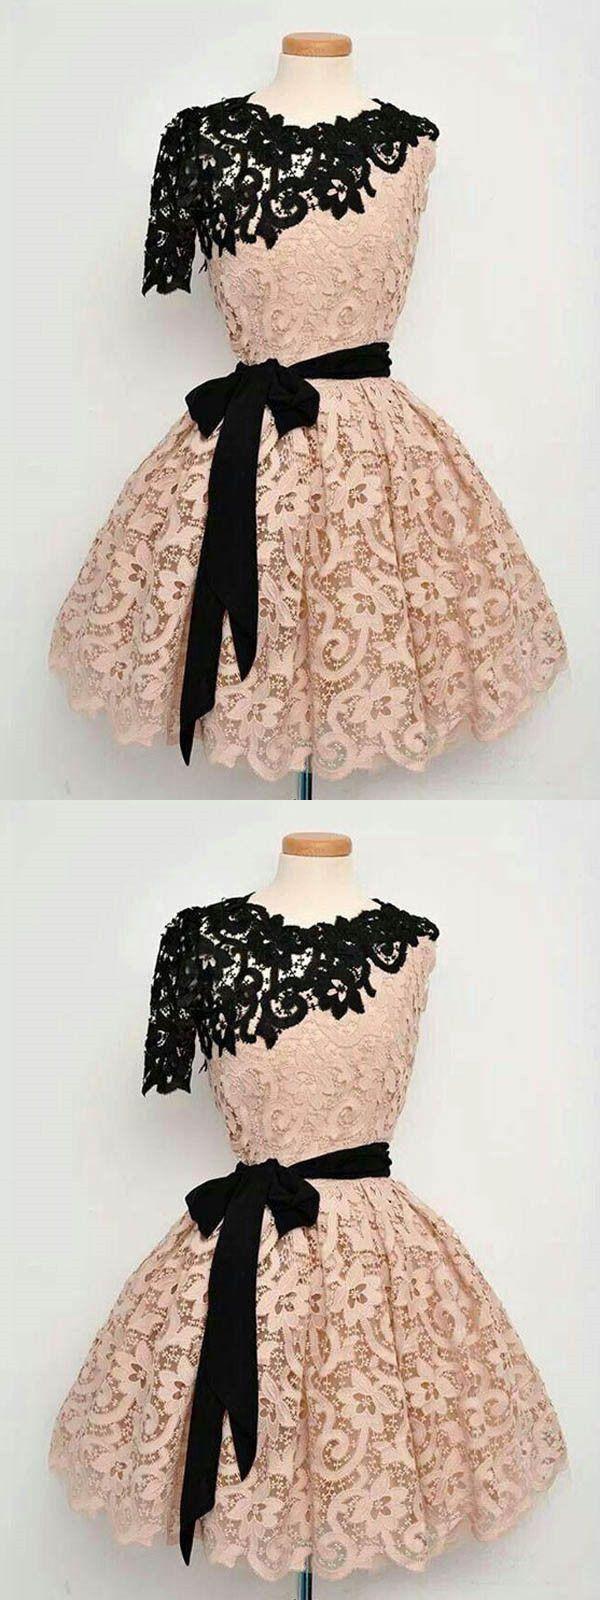 Lace bra under dress september 2019  best Dress images on Pinterest  Low cut dresses Clothing